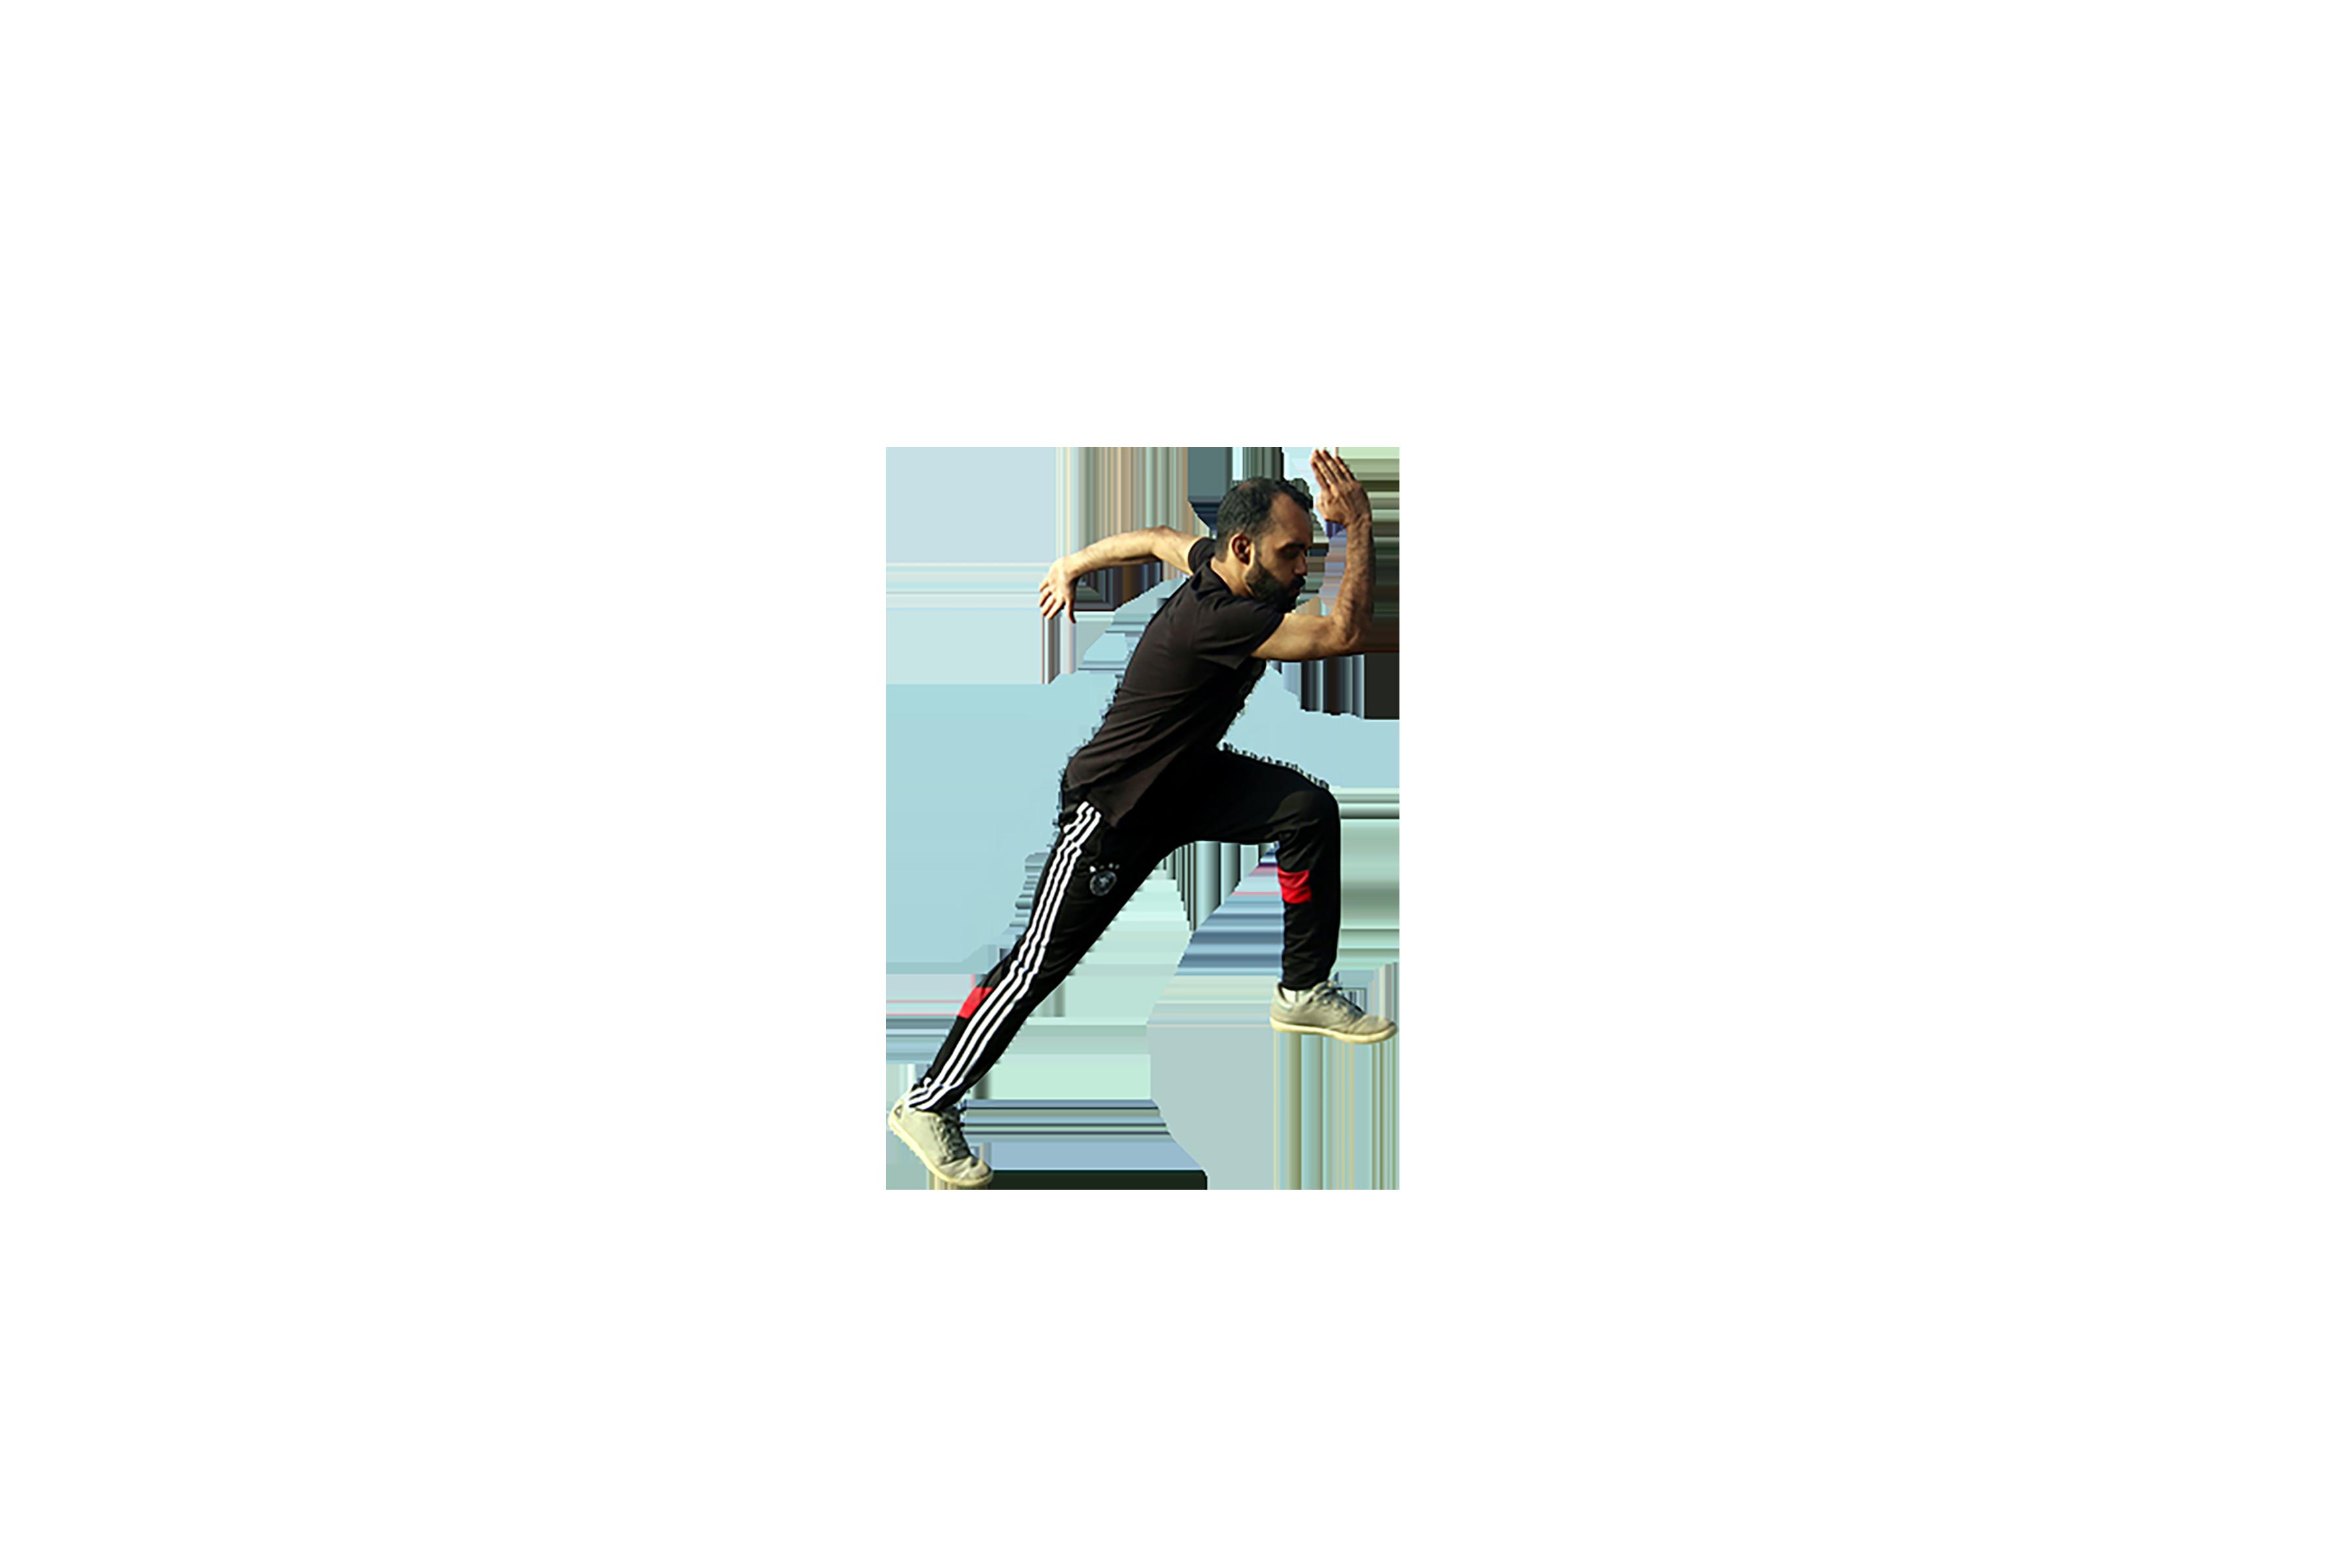 Man doing workout transparent background PNG